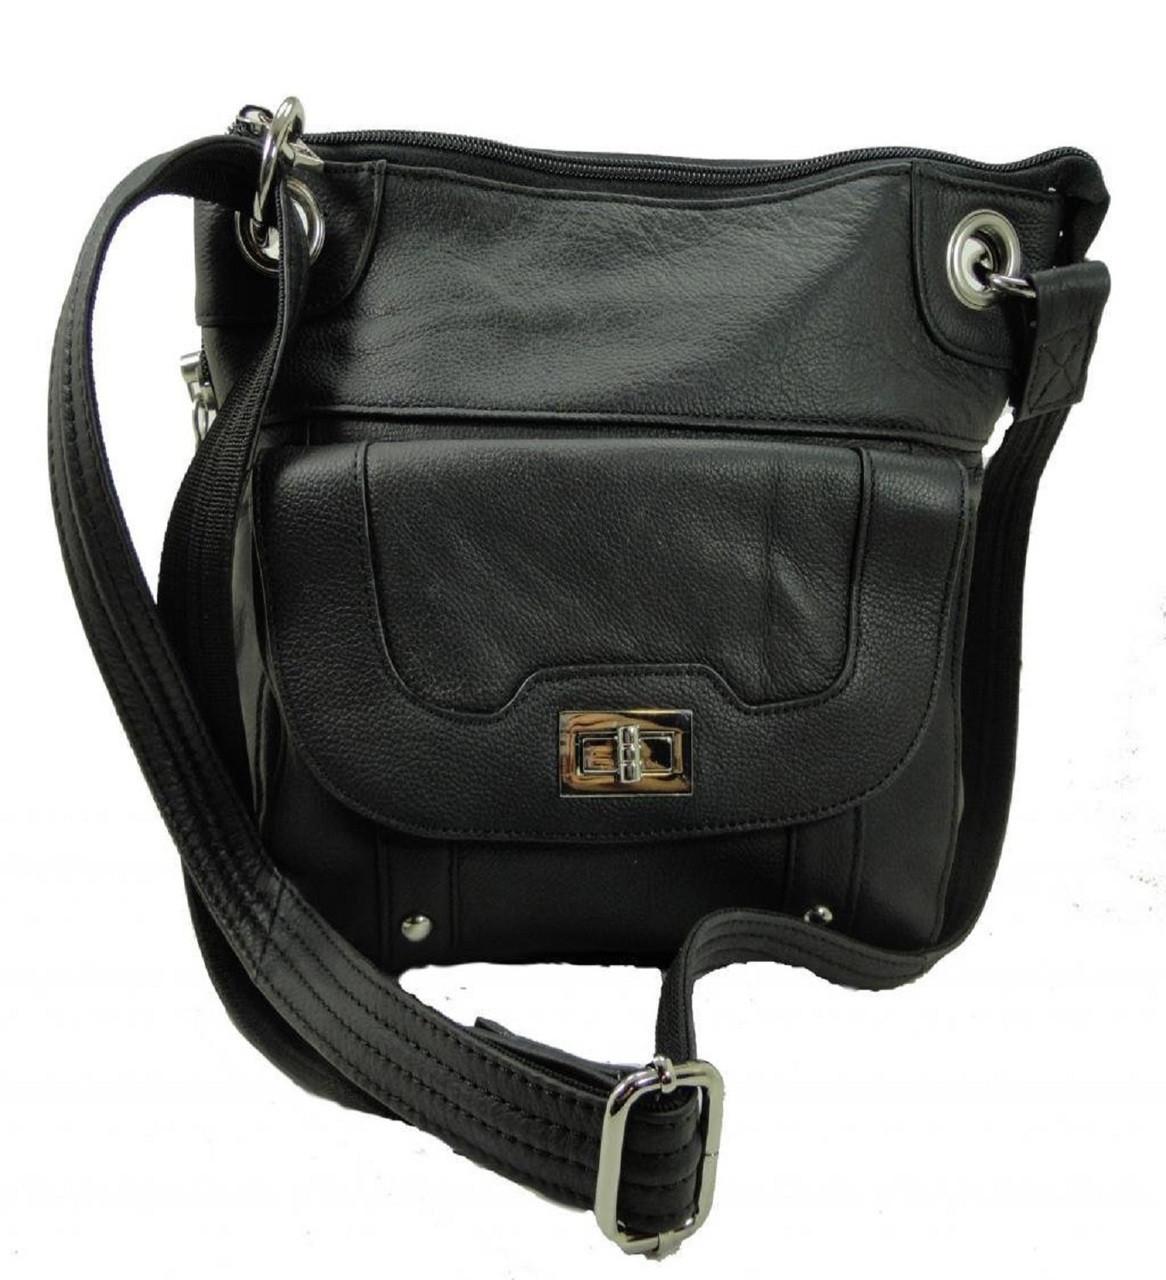 Roma Leathers 7028 Black Genuine Leather Turnlock Concealed Purse ea5164019b01